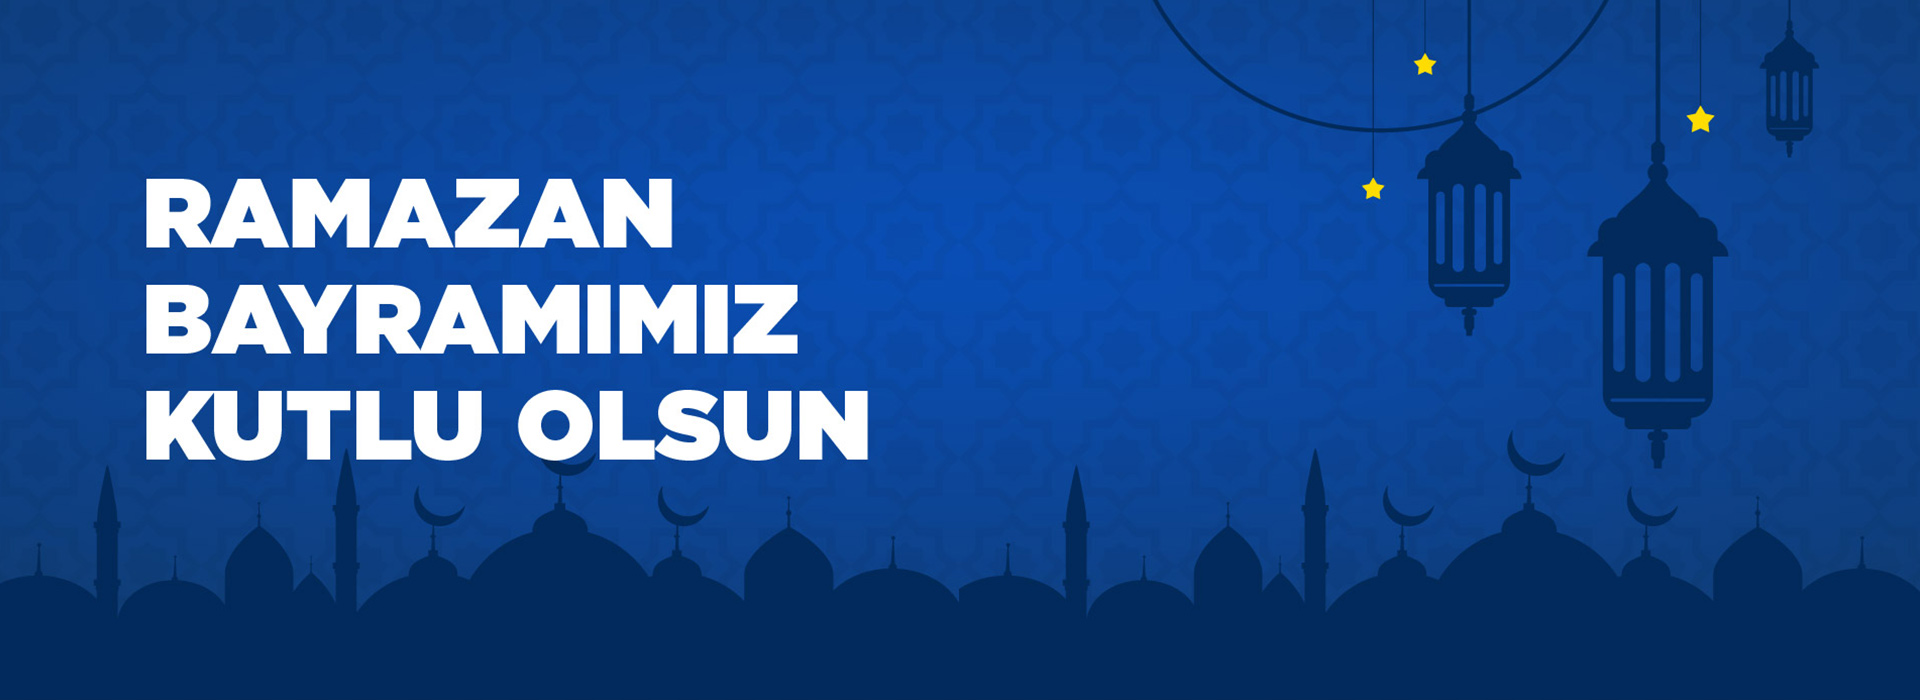 ramazan-bayramimiz-kutlu-olsun-1920x700-2